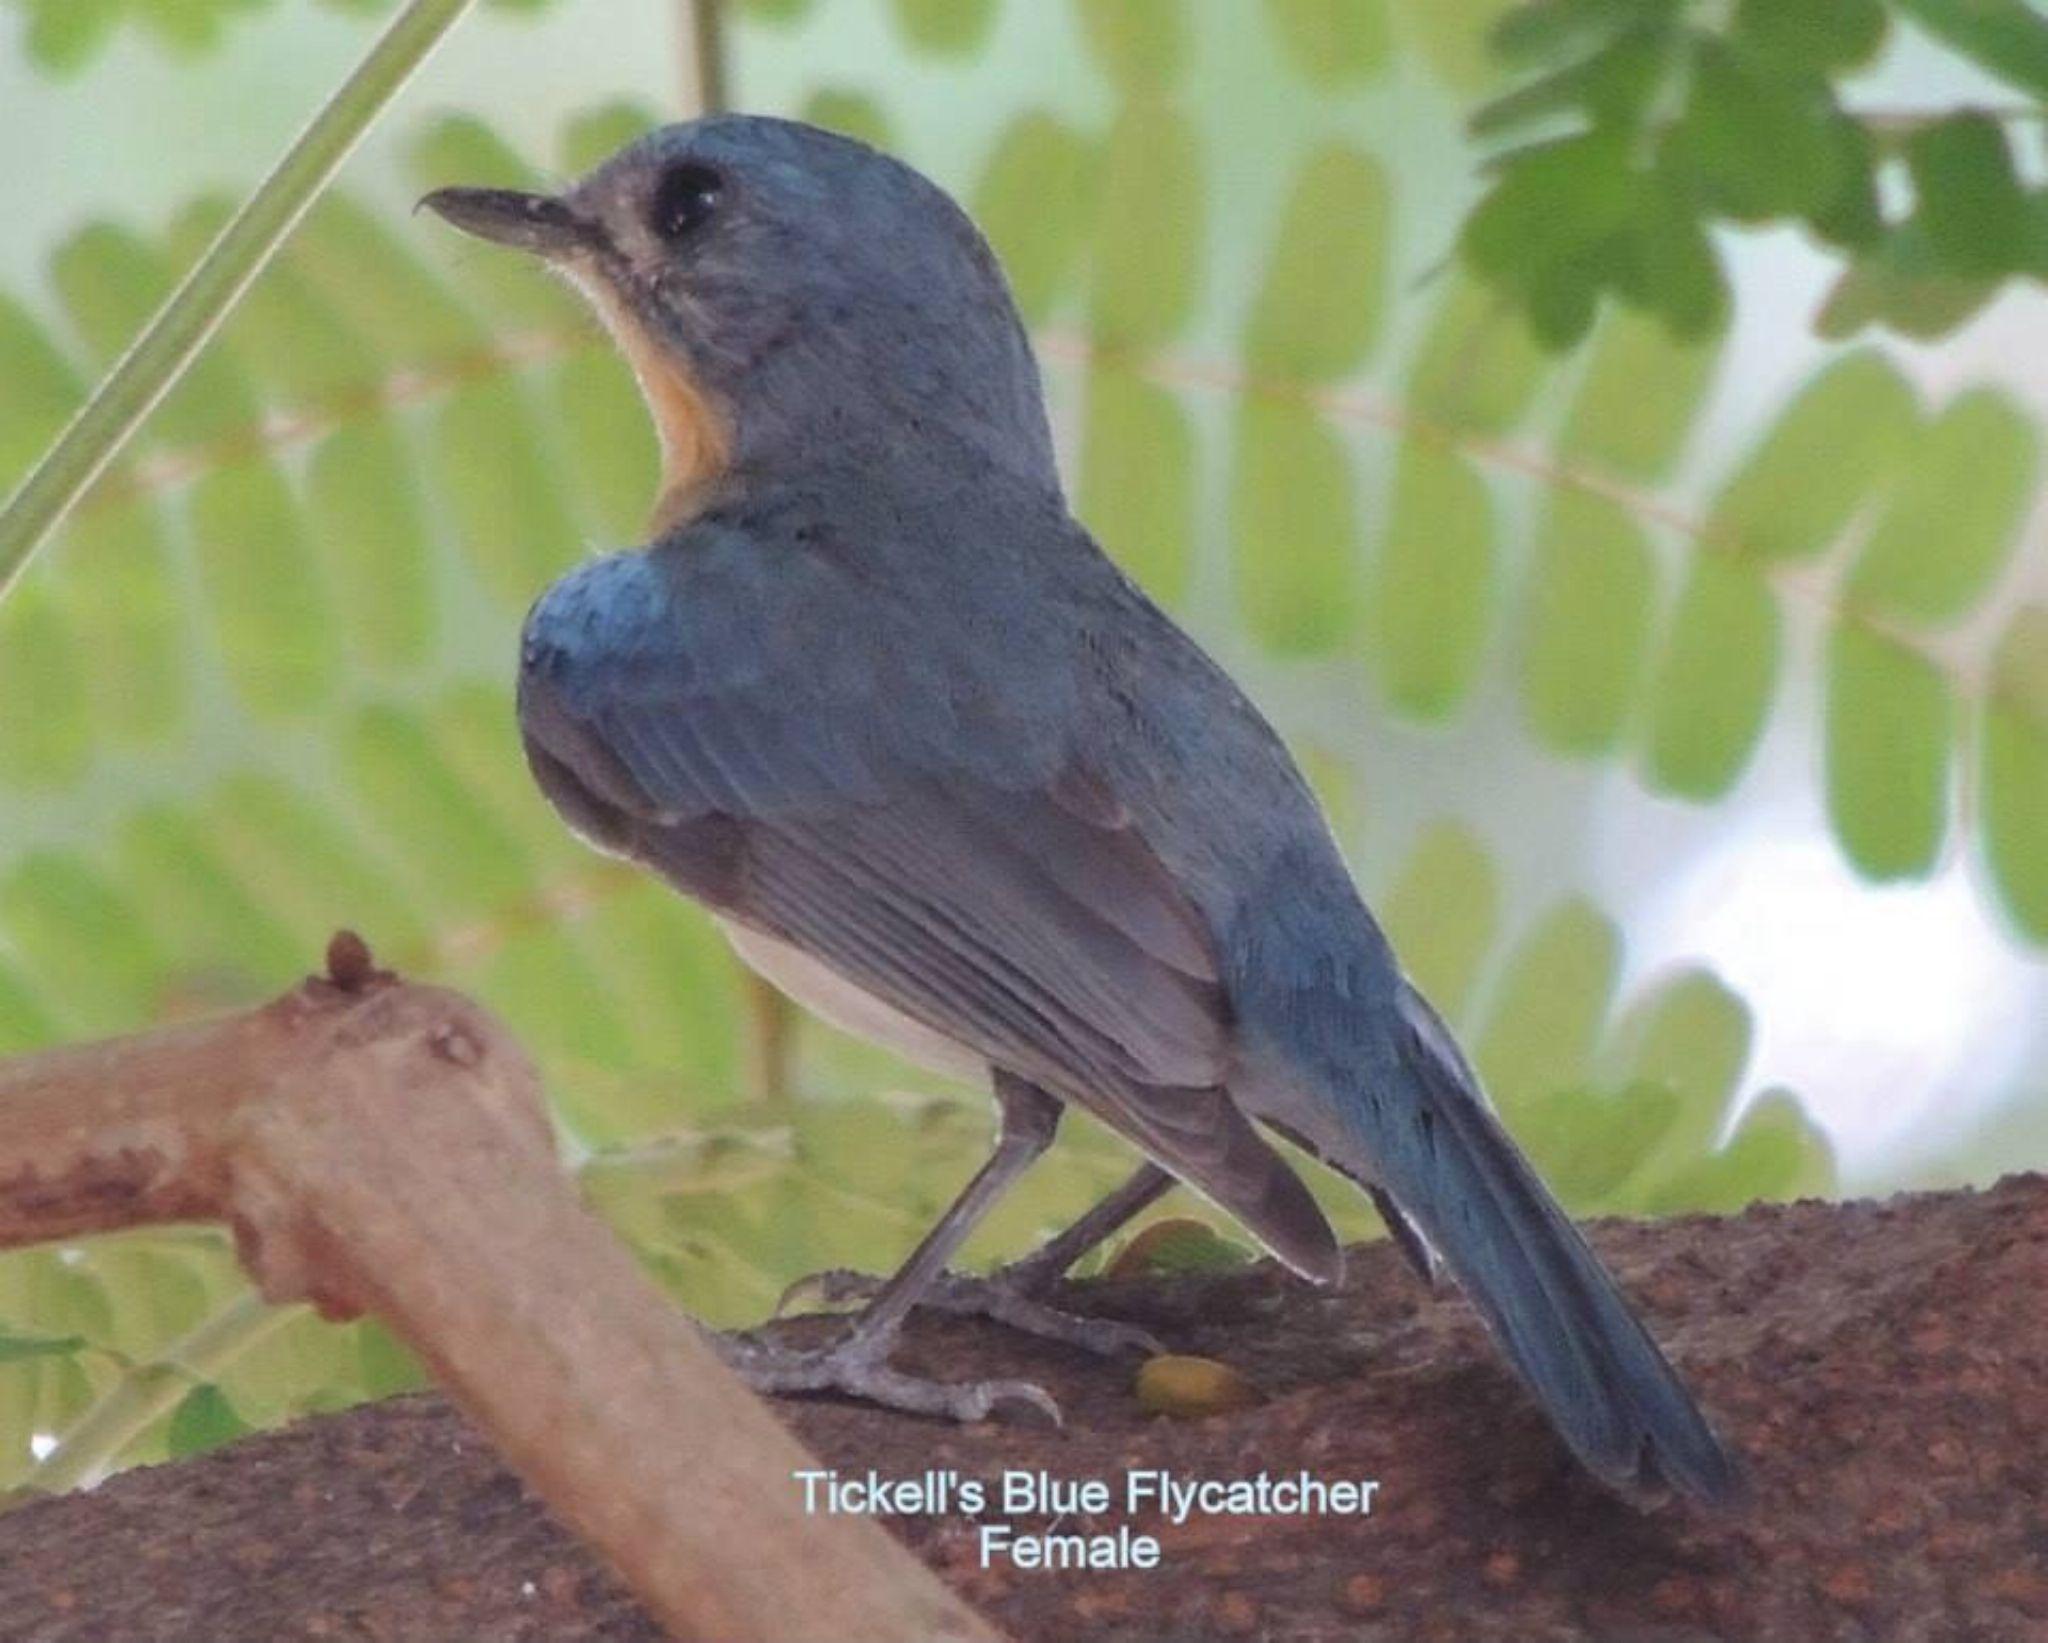 Ticklle's blue flycatcher by Nirmala Sivanand